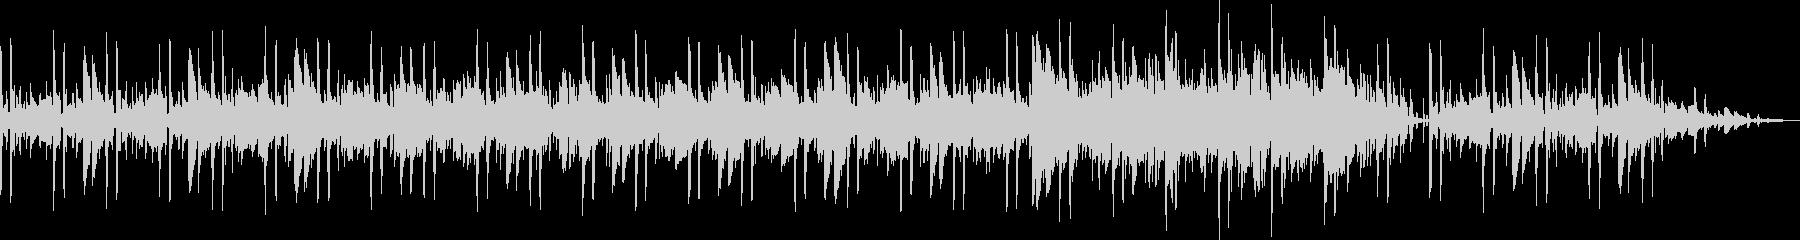 BGM素材(ムーディー、リラックス)の未再生の波形